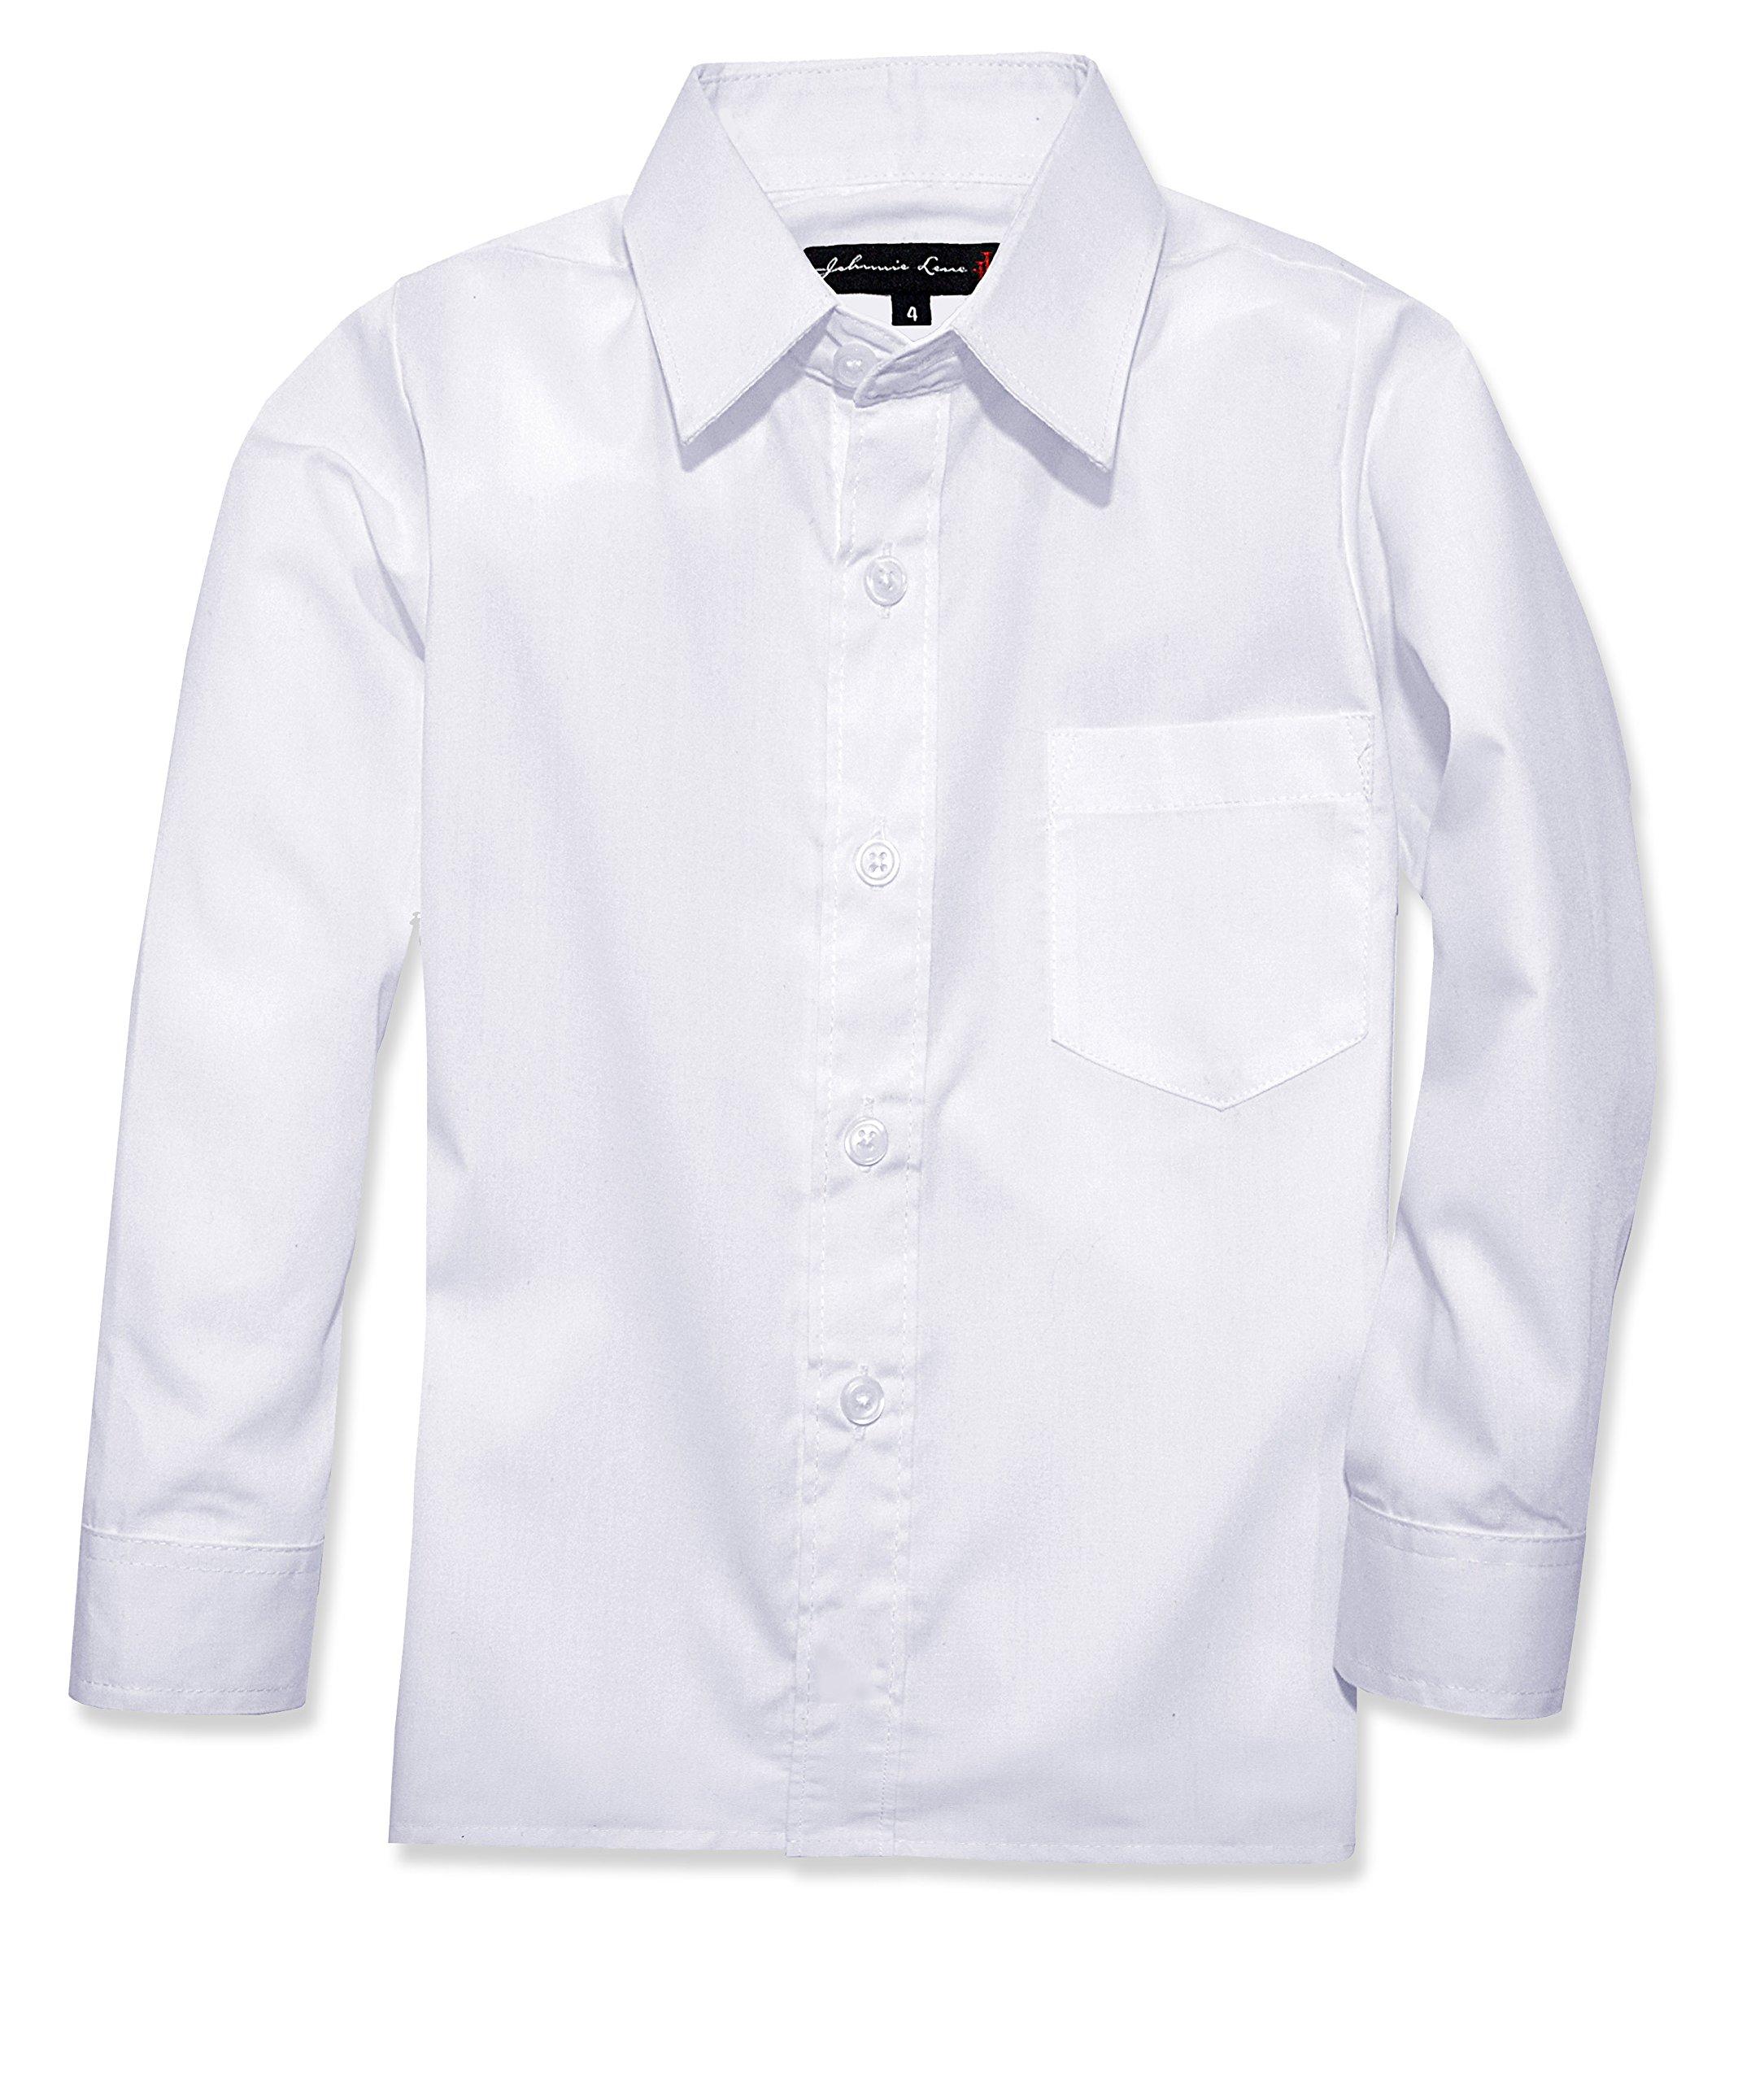 Johnnie Lene Boy's Long Sleeves Dress Shirt from Baby to Teen JJL32 (4, White)